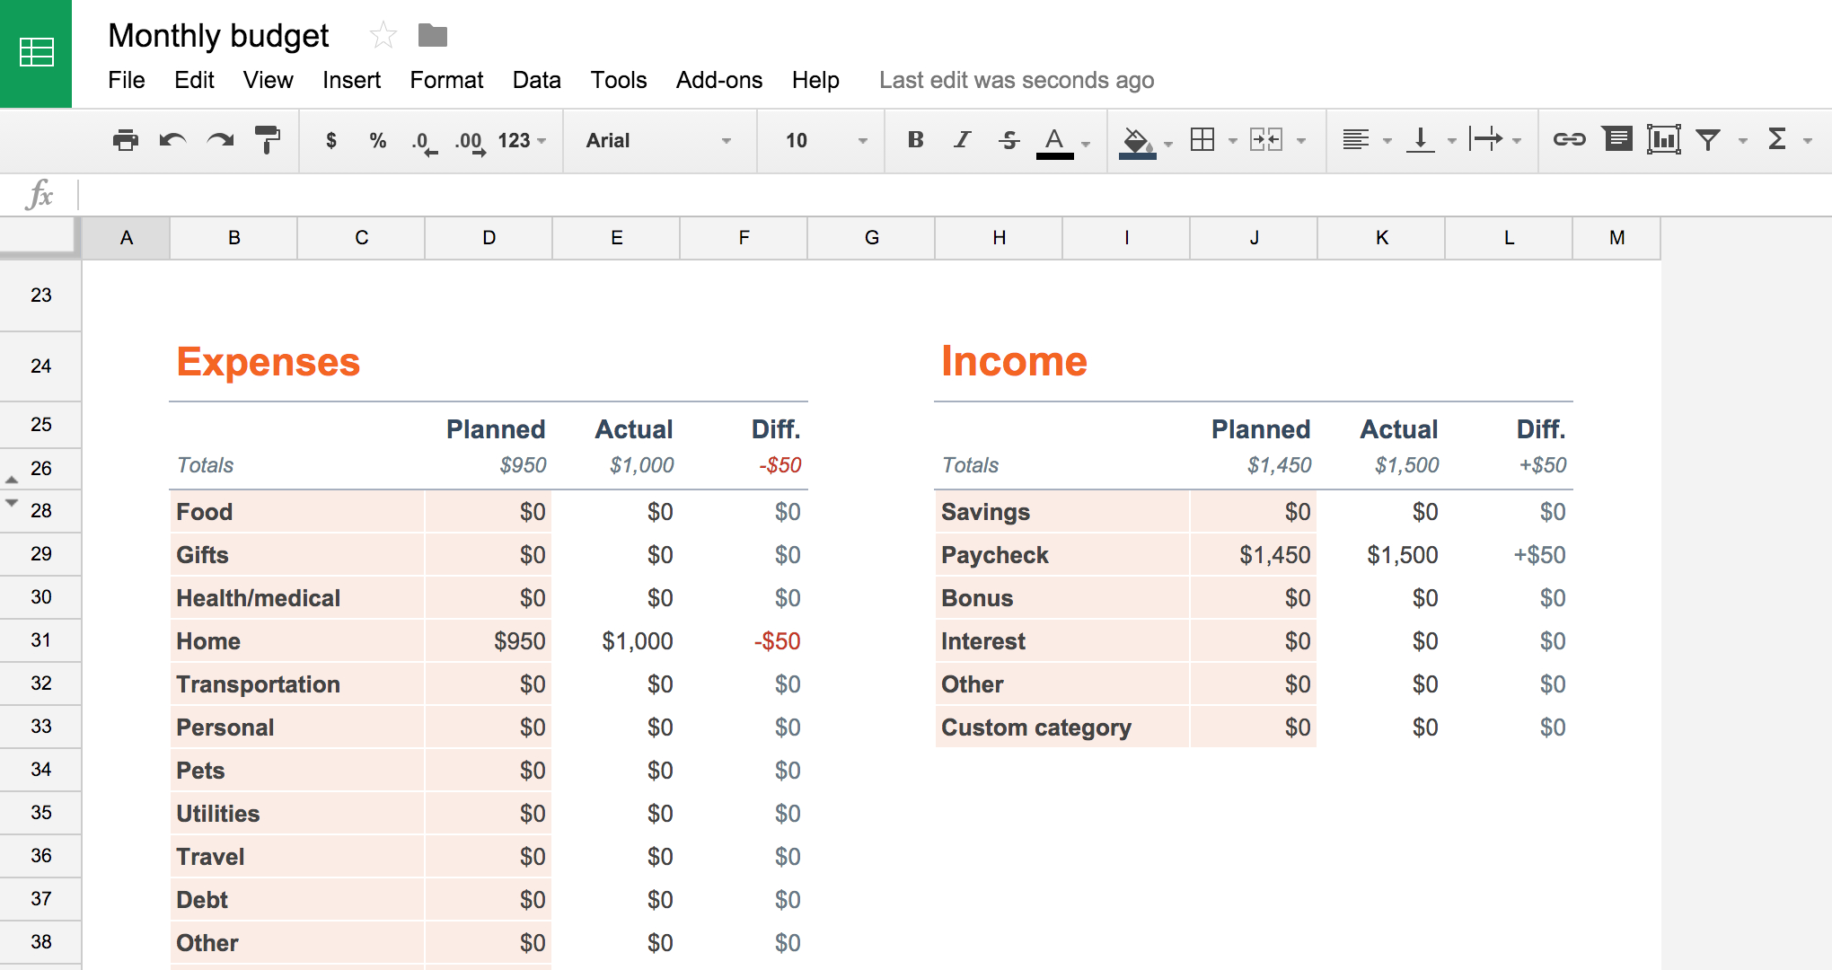 Google Spreadsheet As Database For Website For From Visicalc To Google Sheets: The 12 Best Spreadsheet Apps